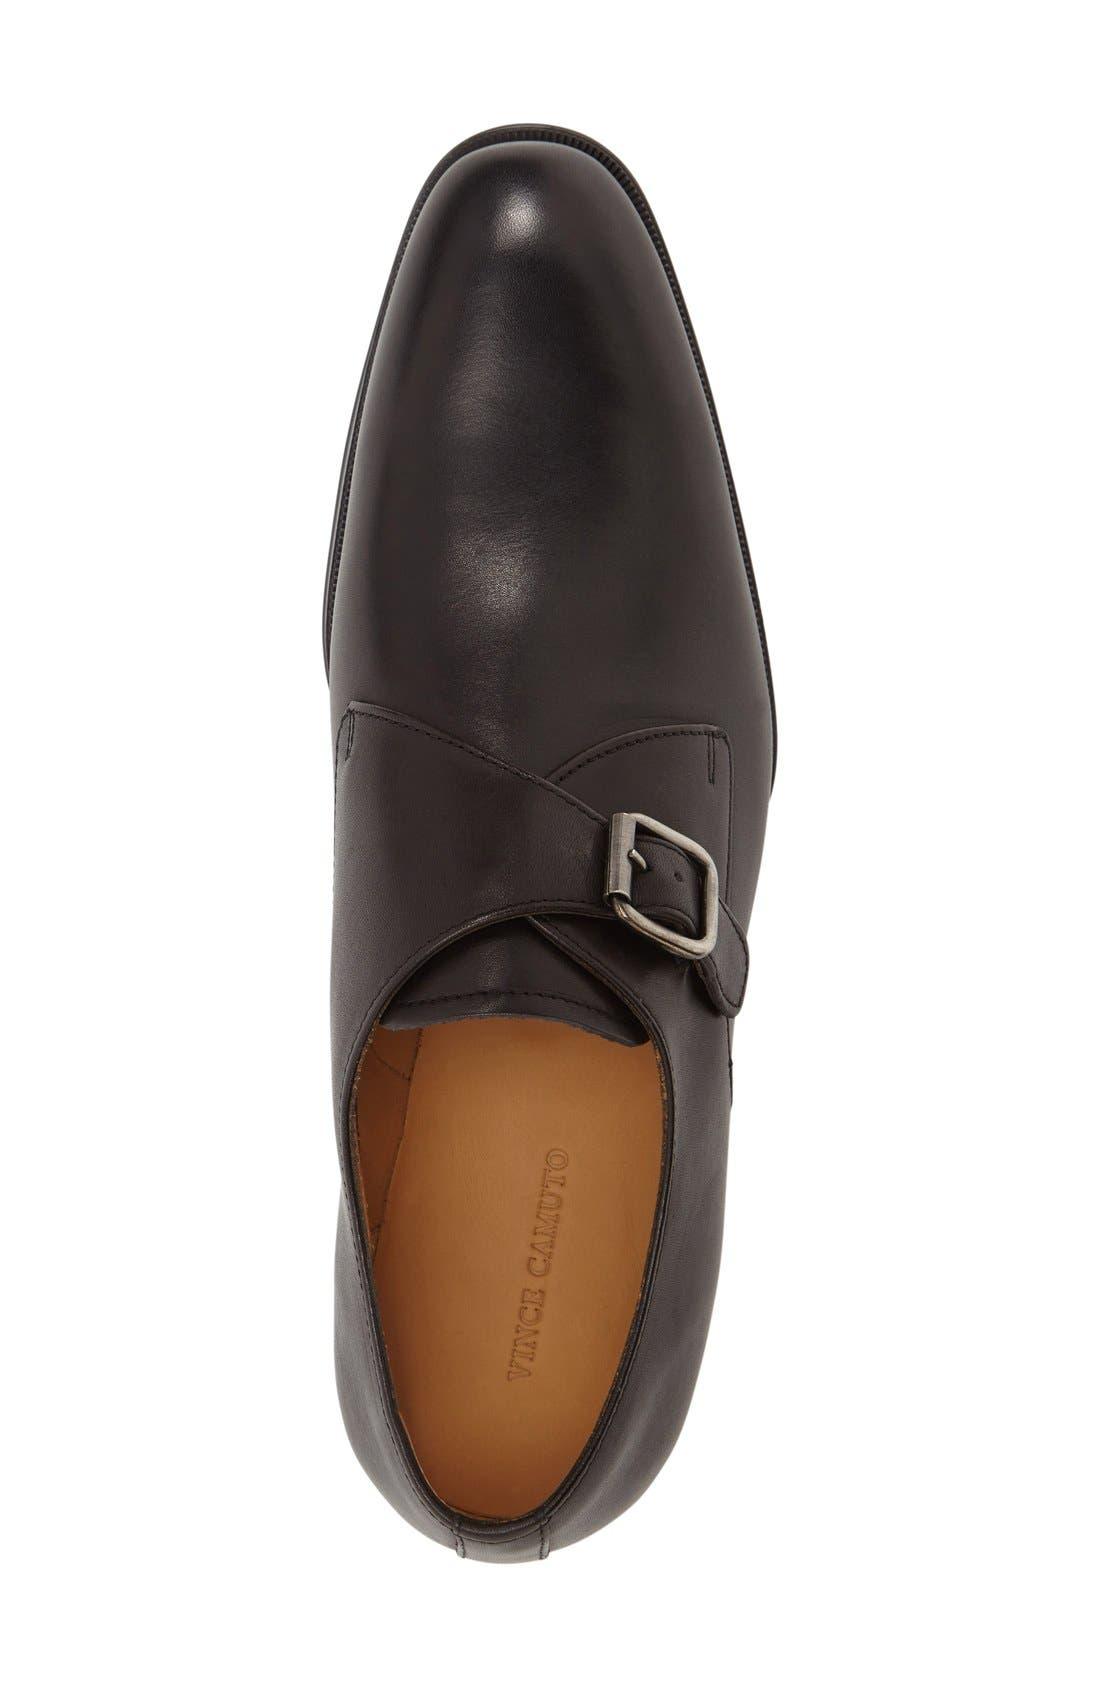 VINCE CAMUTO, 'Trifolo' Monk Strap Shoe, Alternate thumbnail 4, color, 001